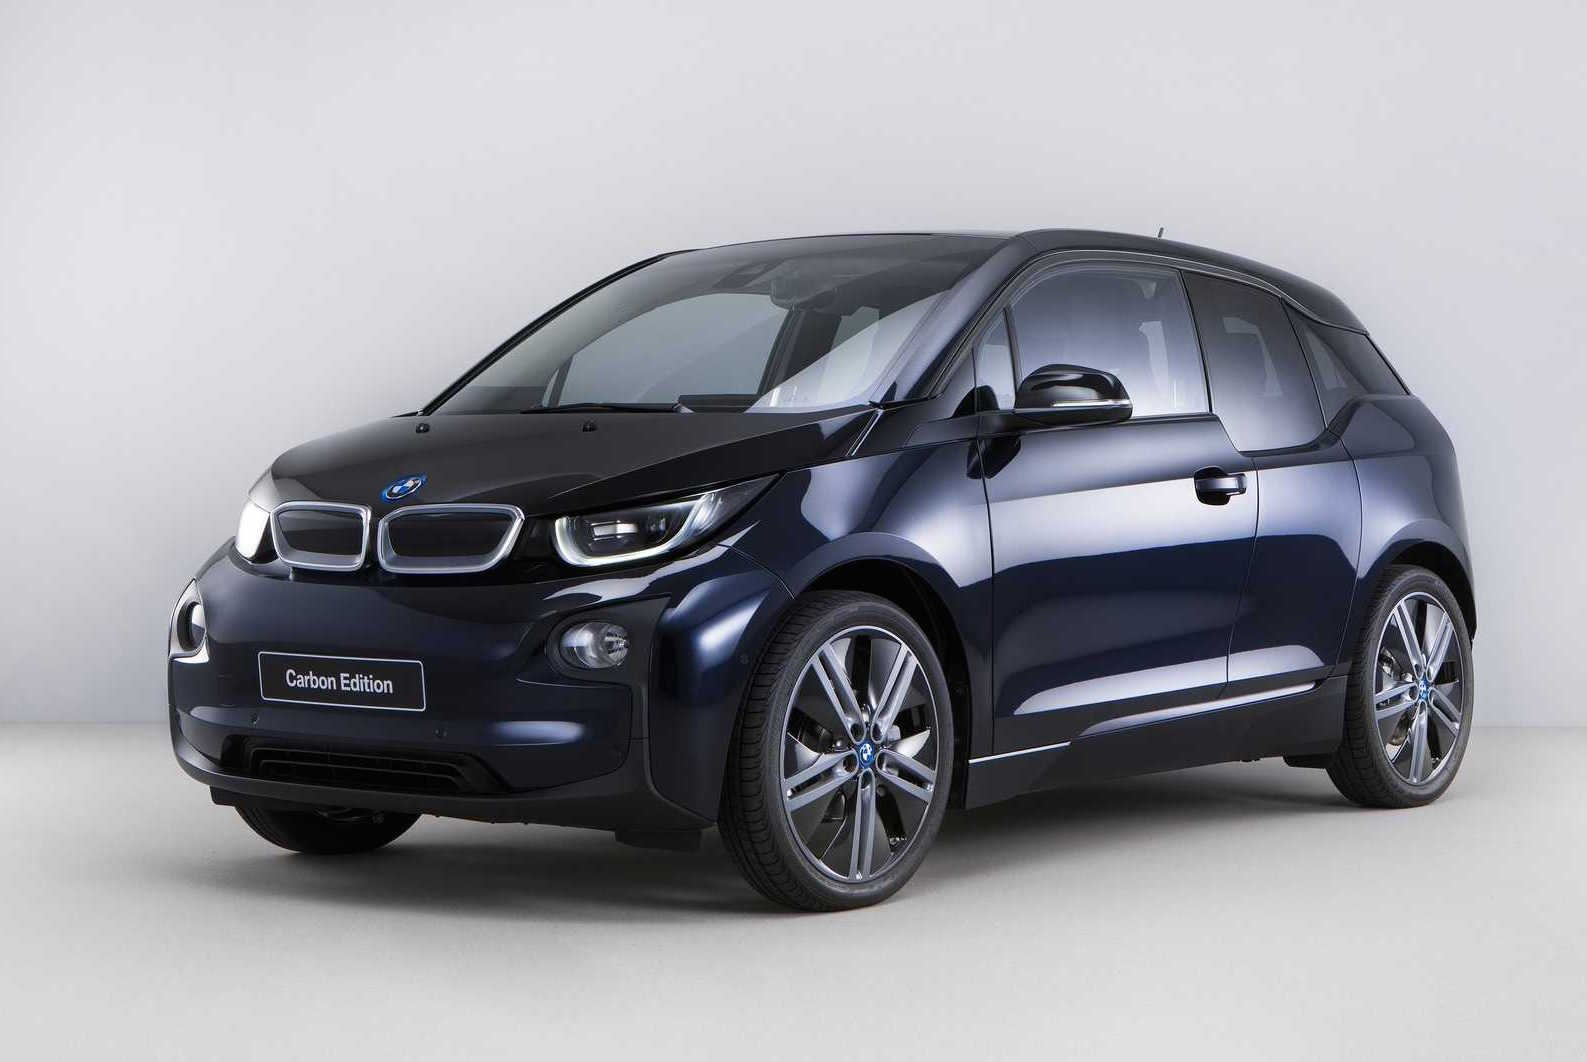 bmw i3 carbon edition announced in netherlands performancedrive. Black Bedroom Furniture Sets. Home Design Ideas